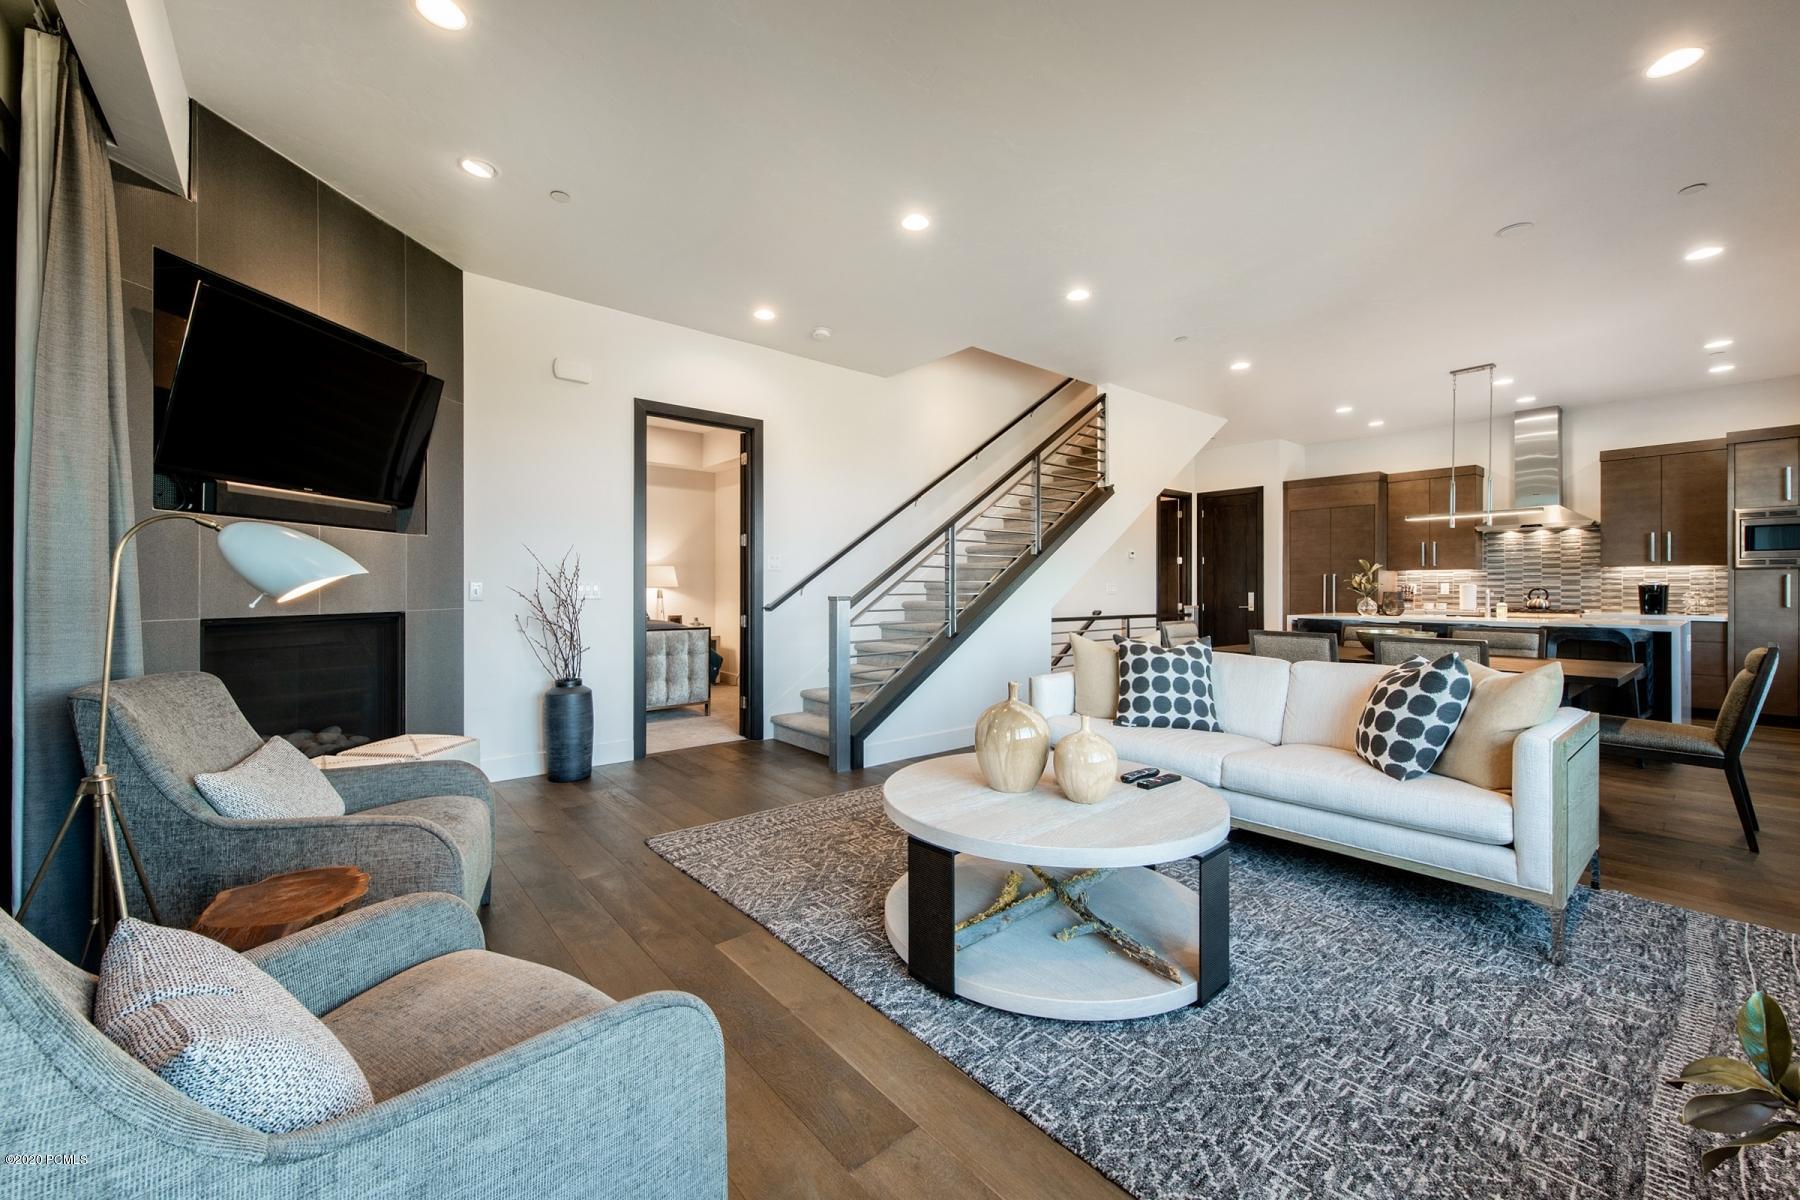 4273 Willow Draw Road, Park City, Utah 84098, 5 Bedrooms Bedrooms, ,5 BathroomsBathrooms,Condominium,For Sale,Willow Draw,11605930